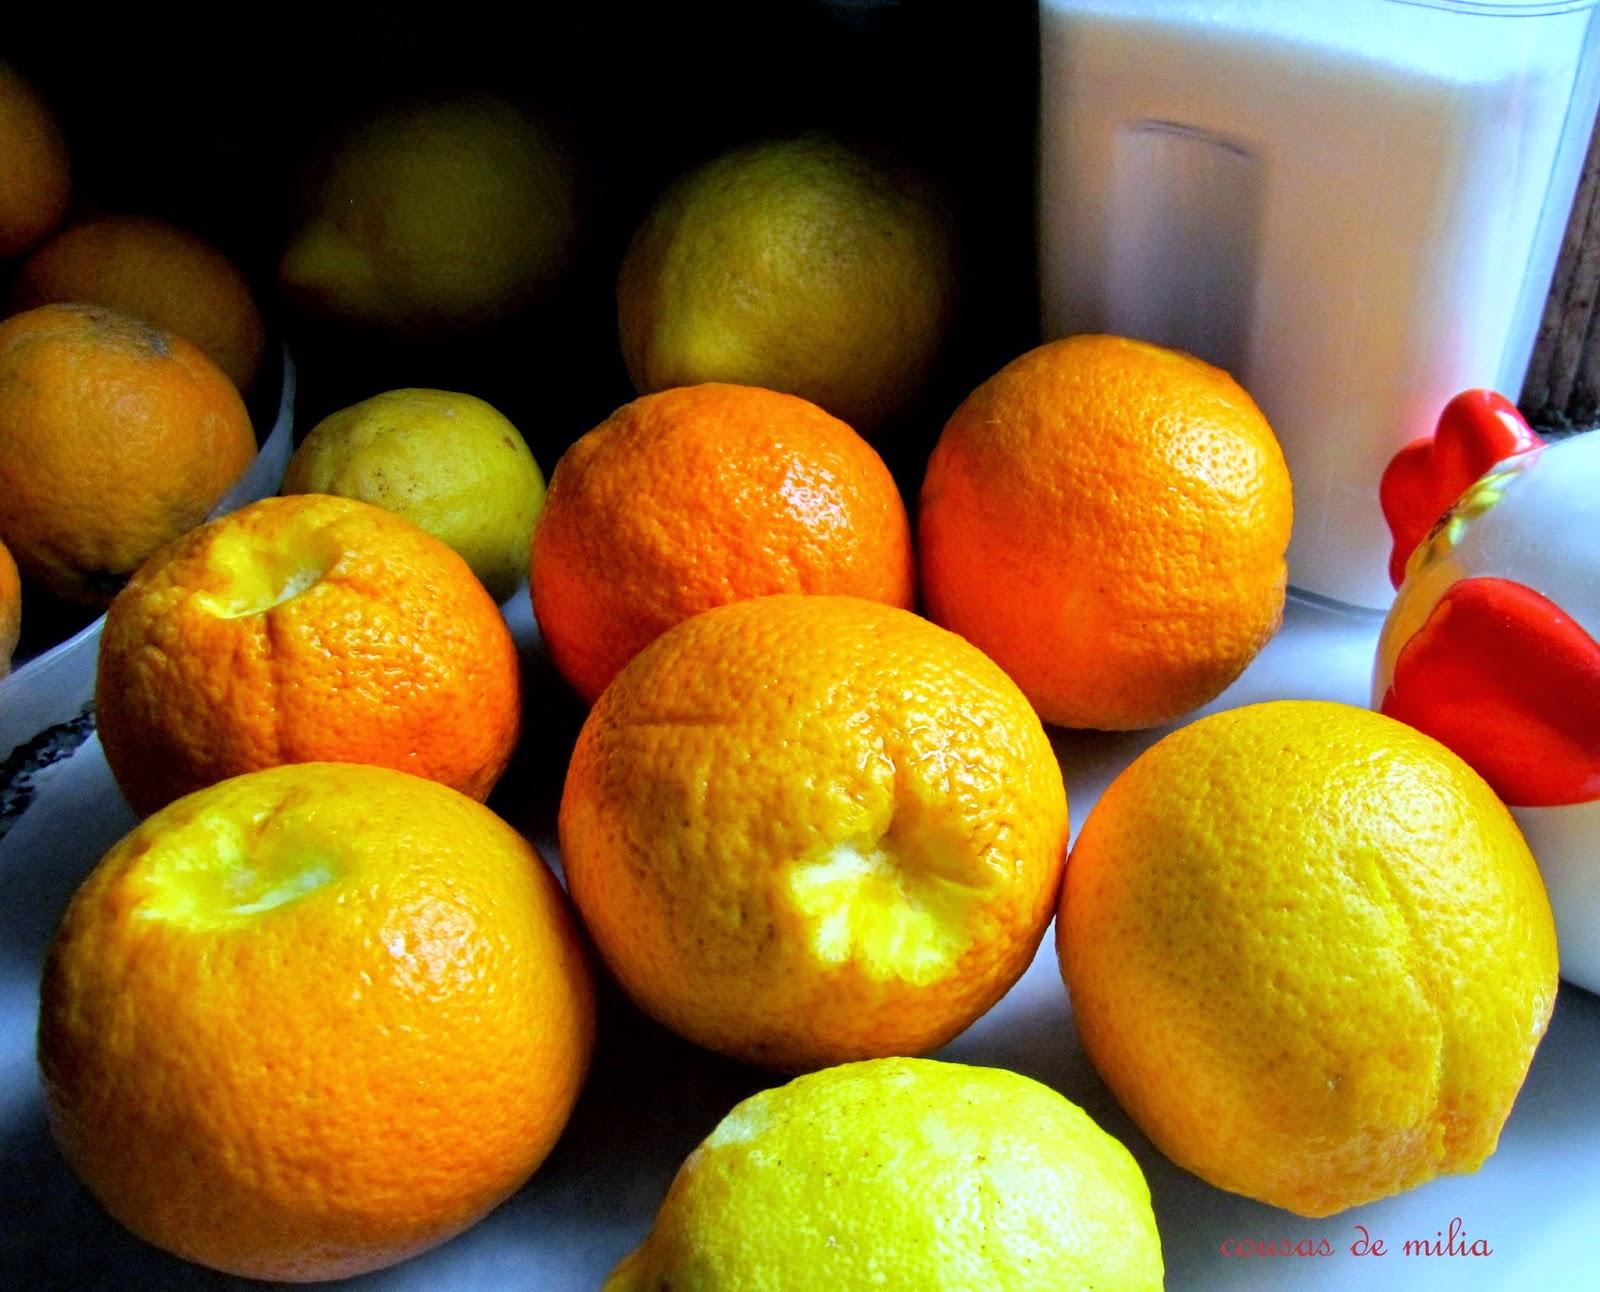 Mermelada de naranja con tropezones